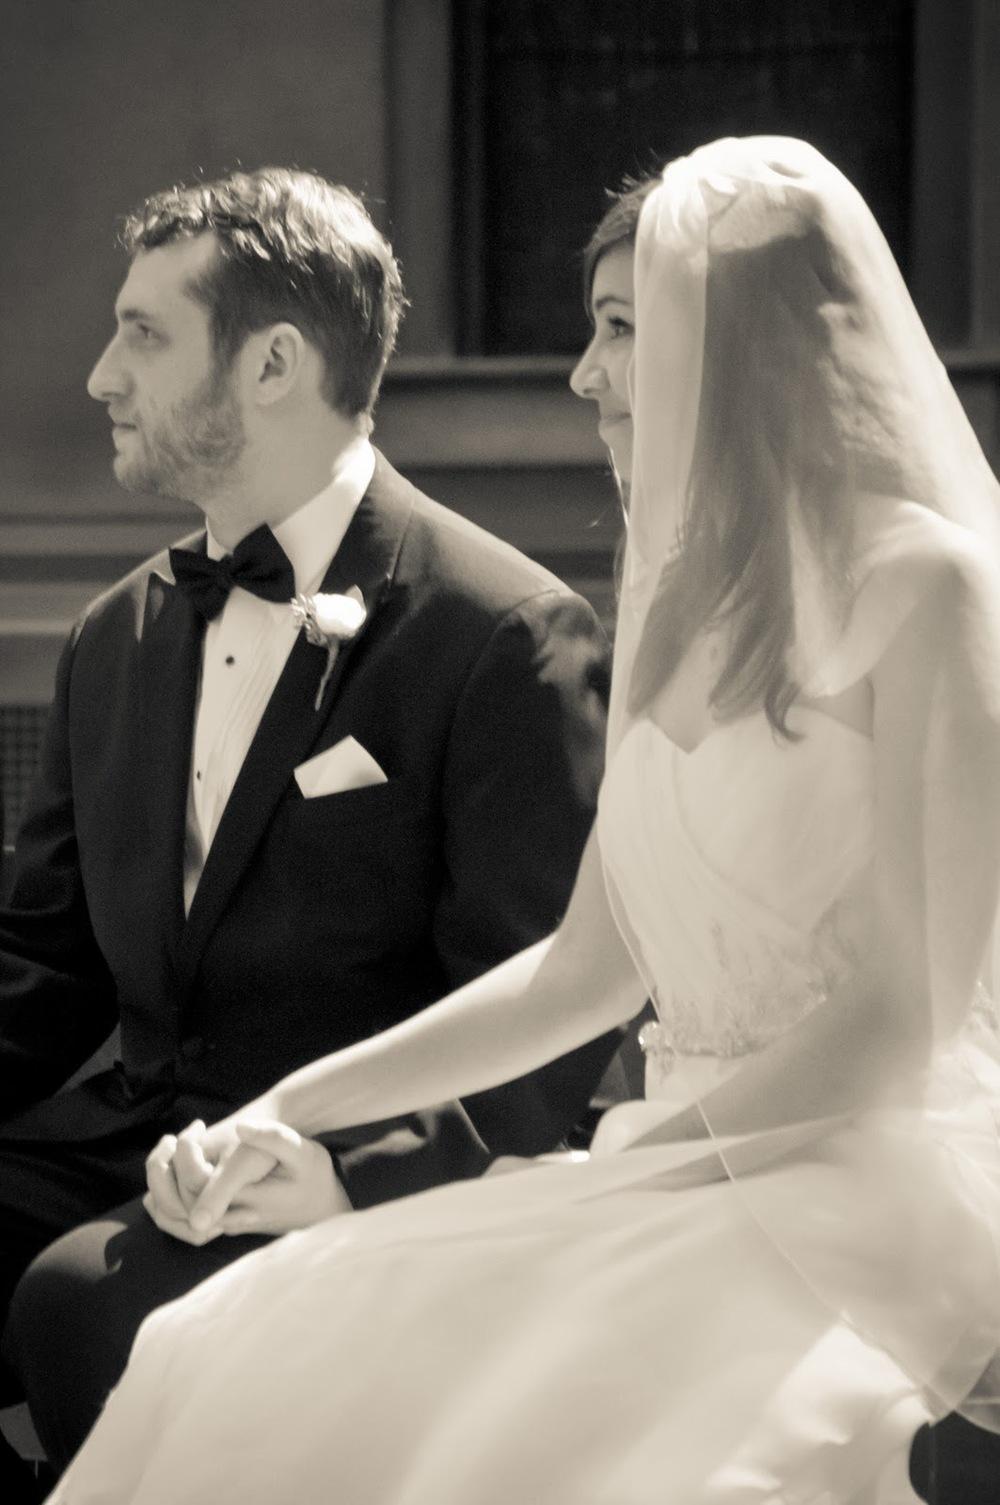 Tonietto_Bride_Groom_Wedding.jpg